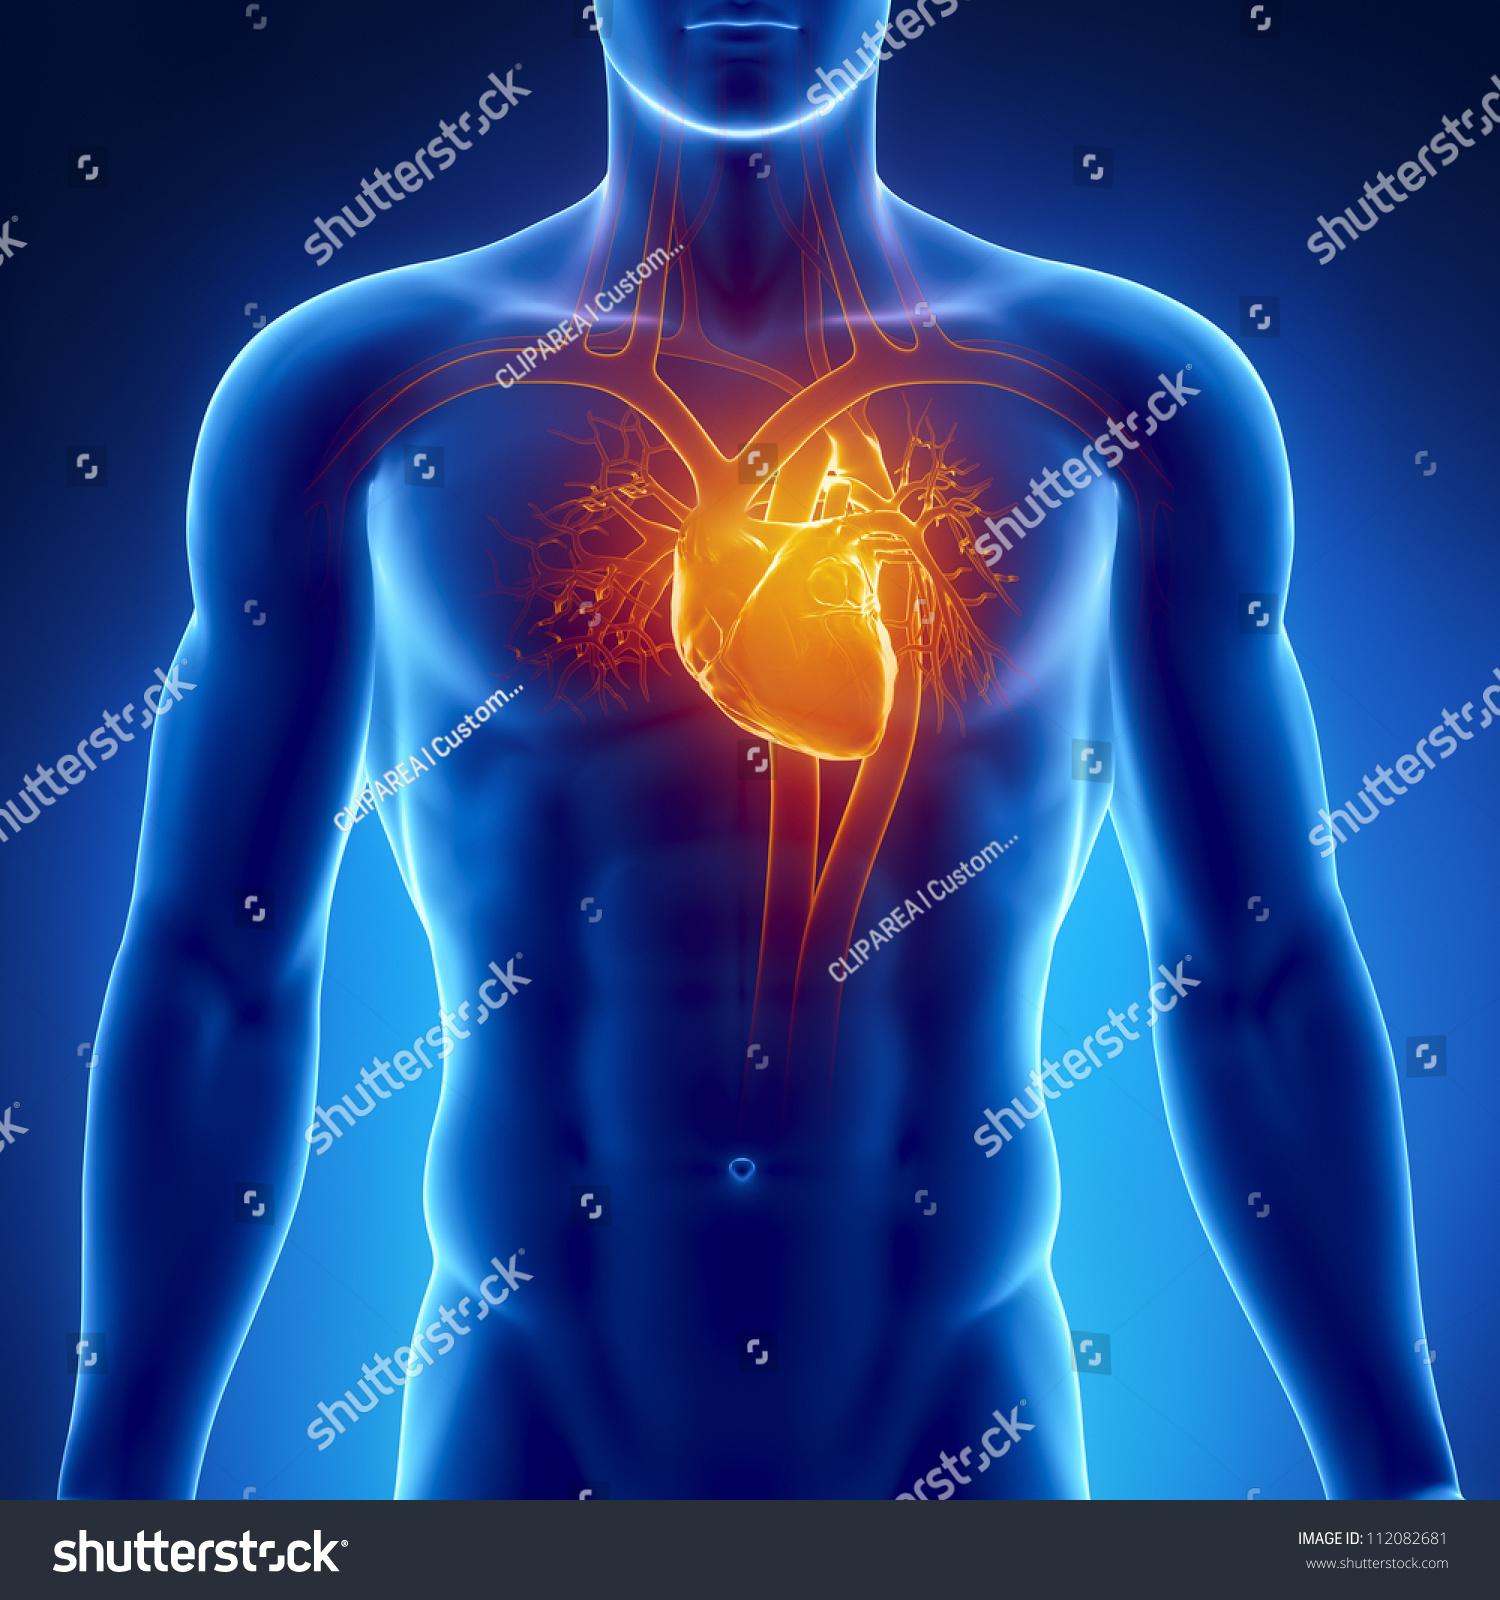 Human Heart Anatomy Stockillustration 112082681 – Shutterstock